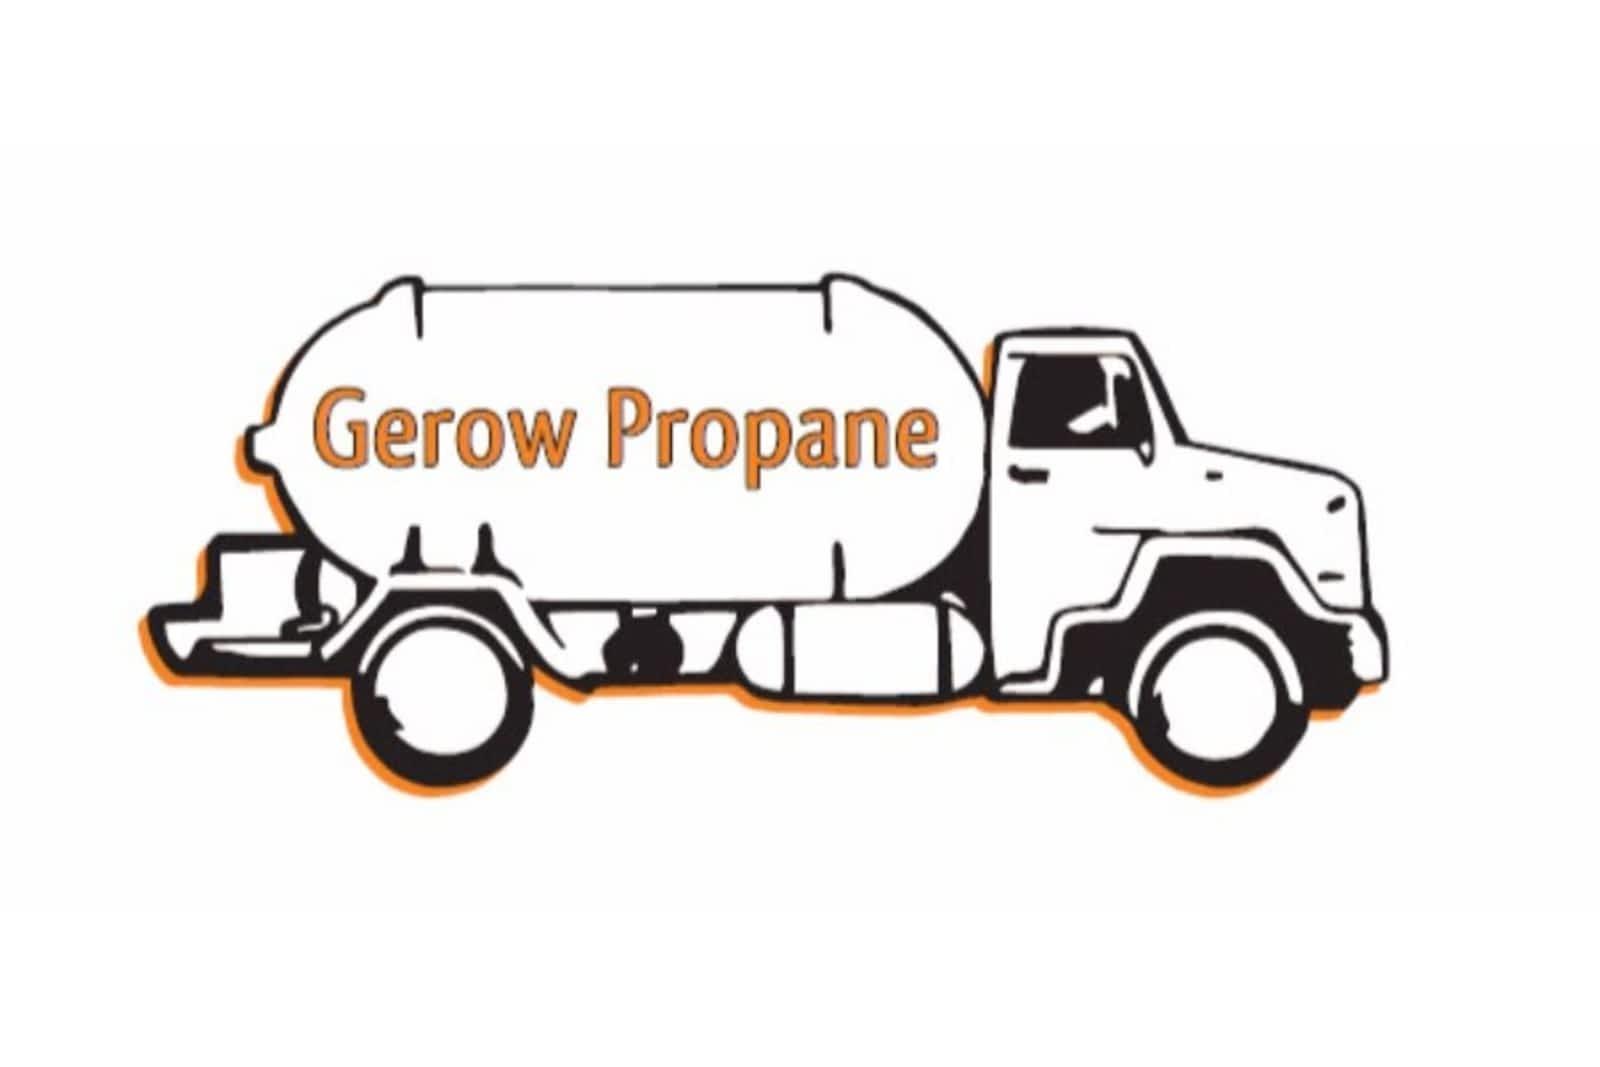 Home - Gerow Propane